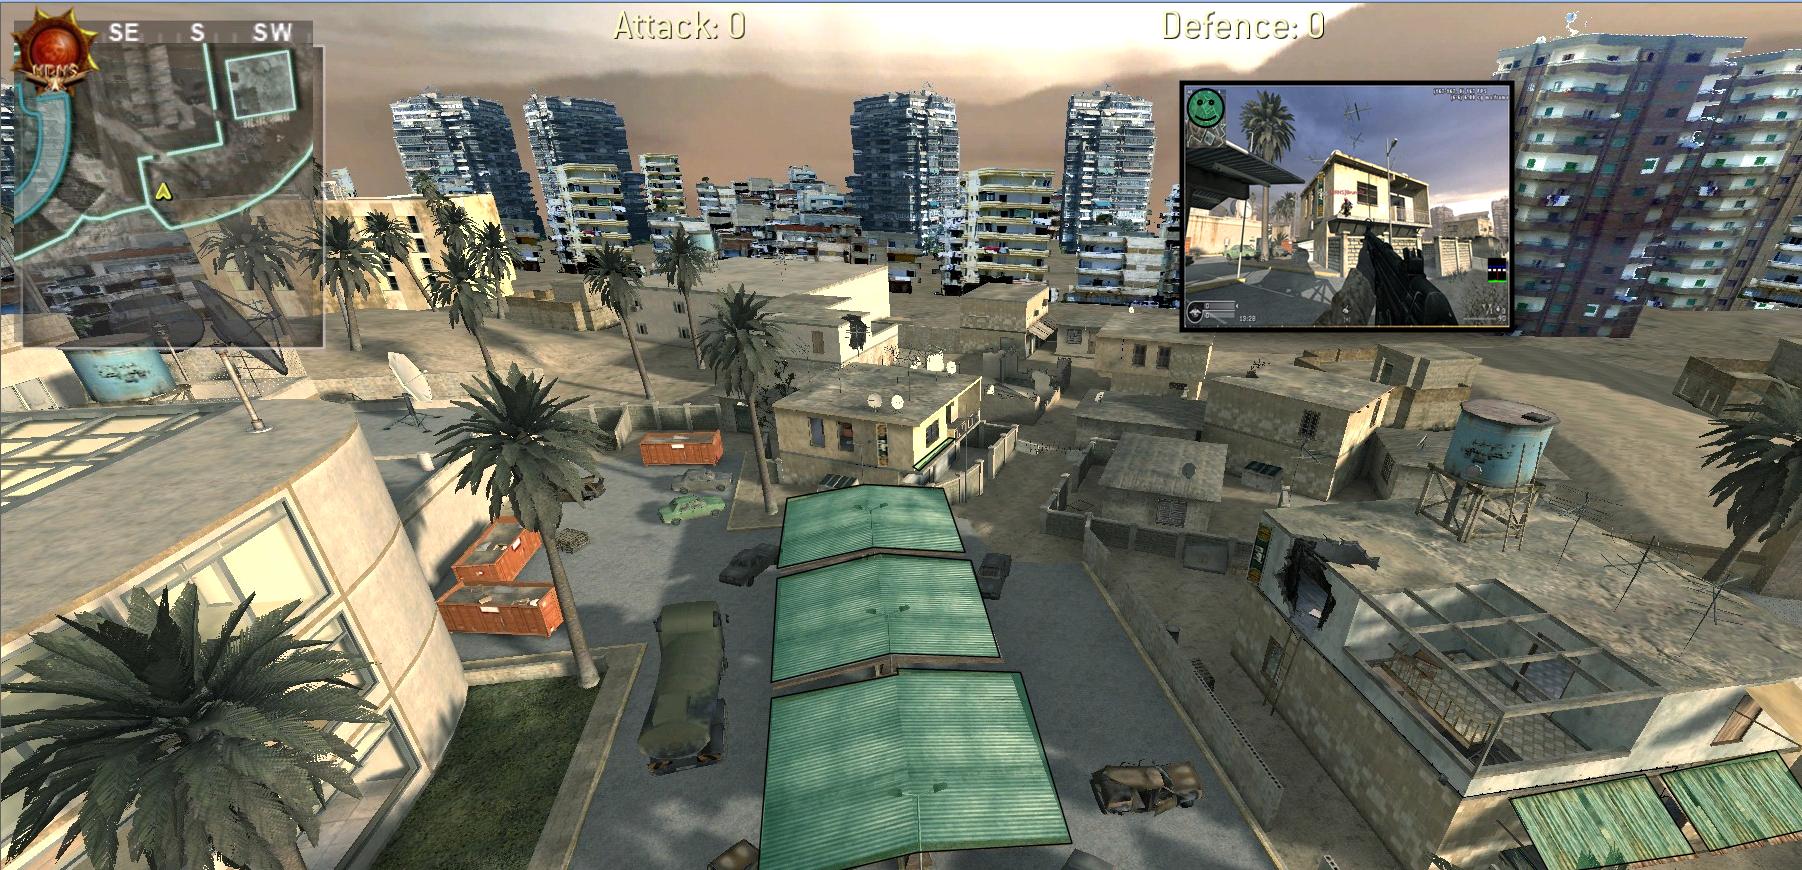 http://nrns-games.com/gallery/27551_28_11_15_3_48_53.png